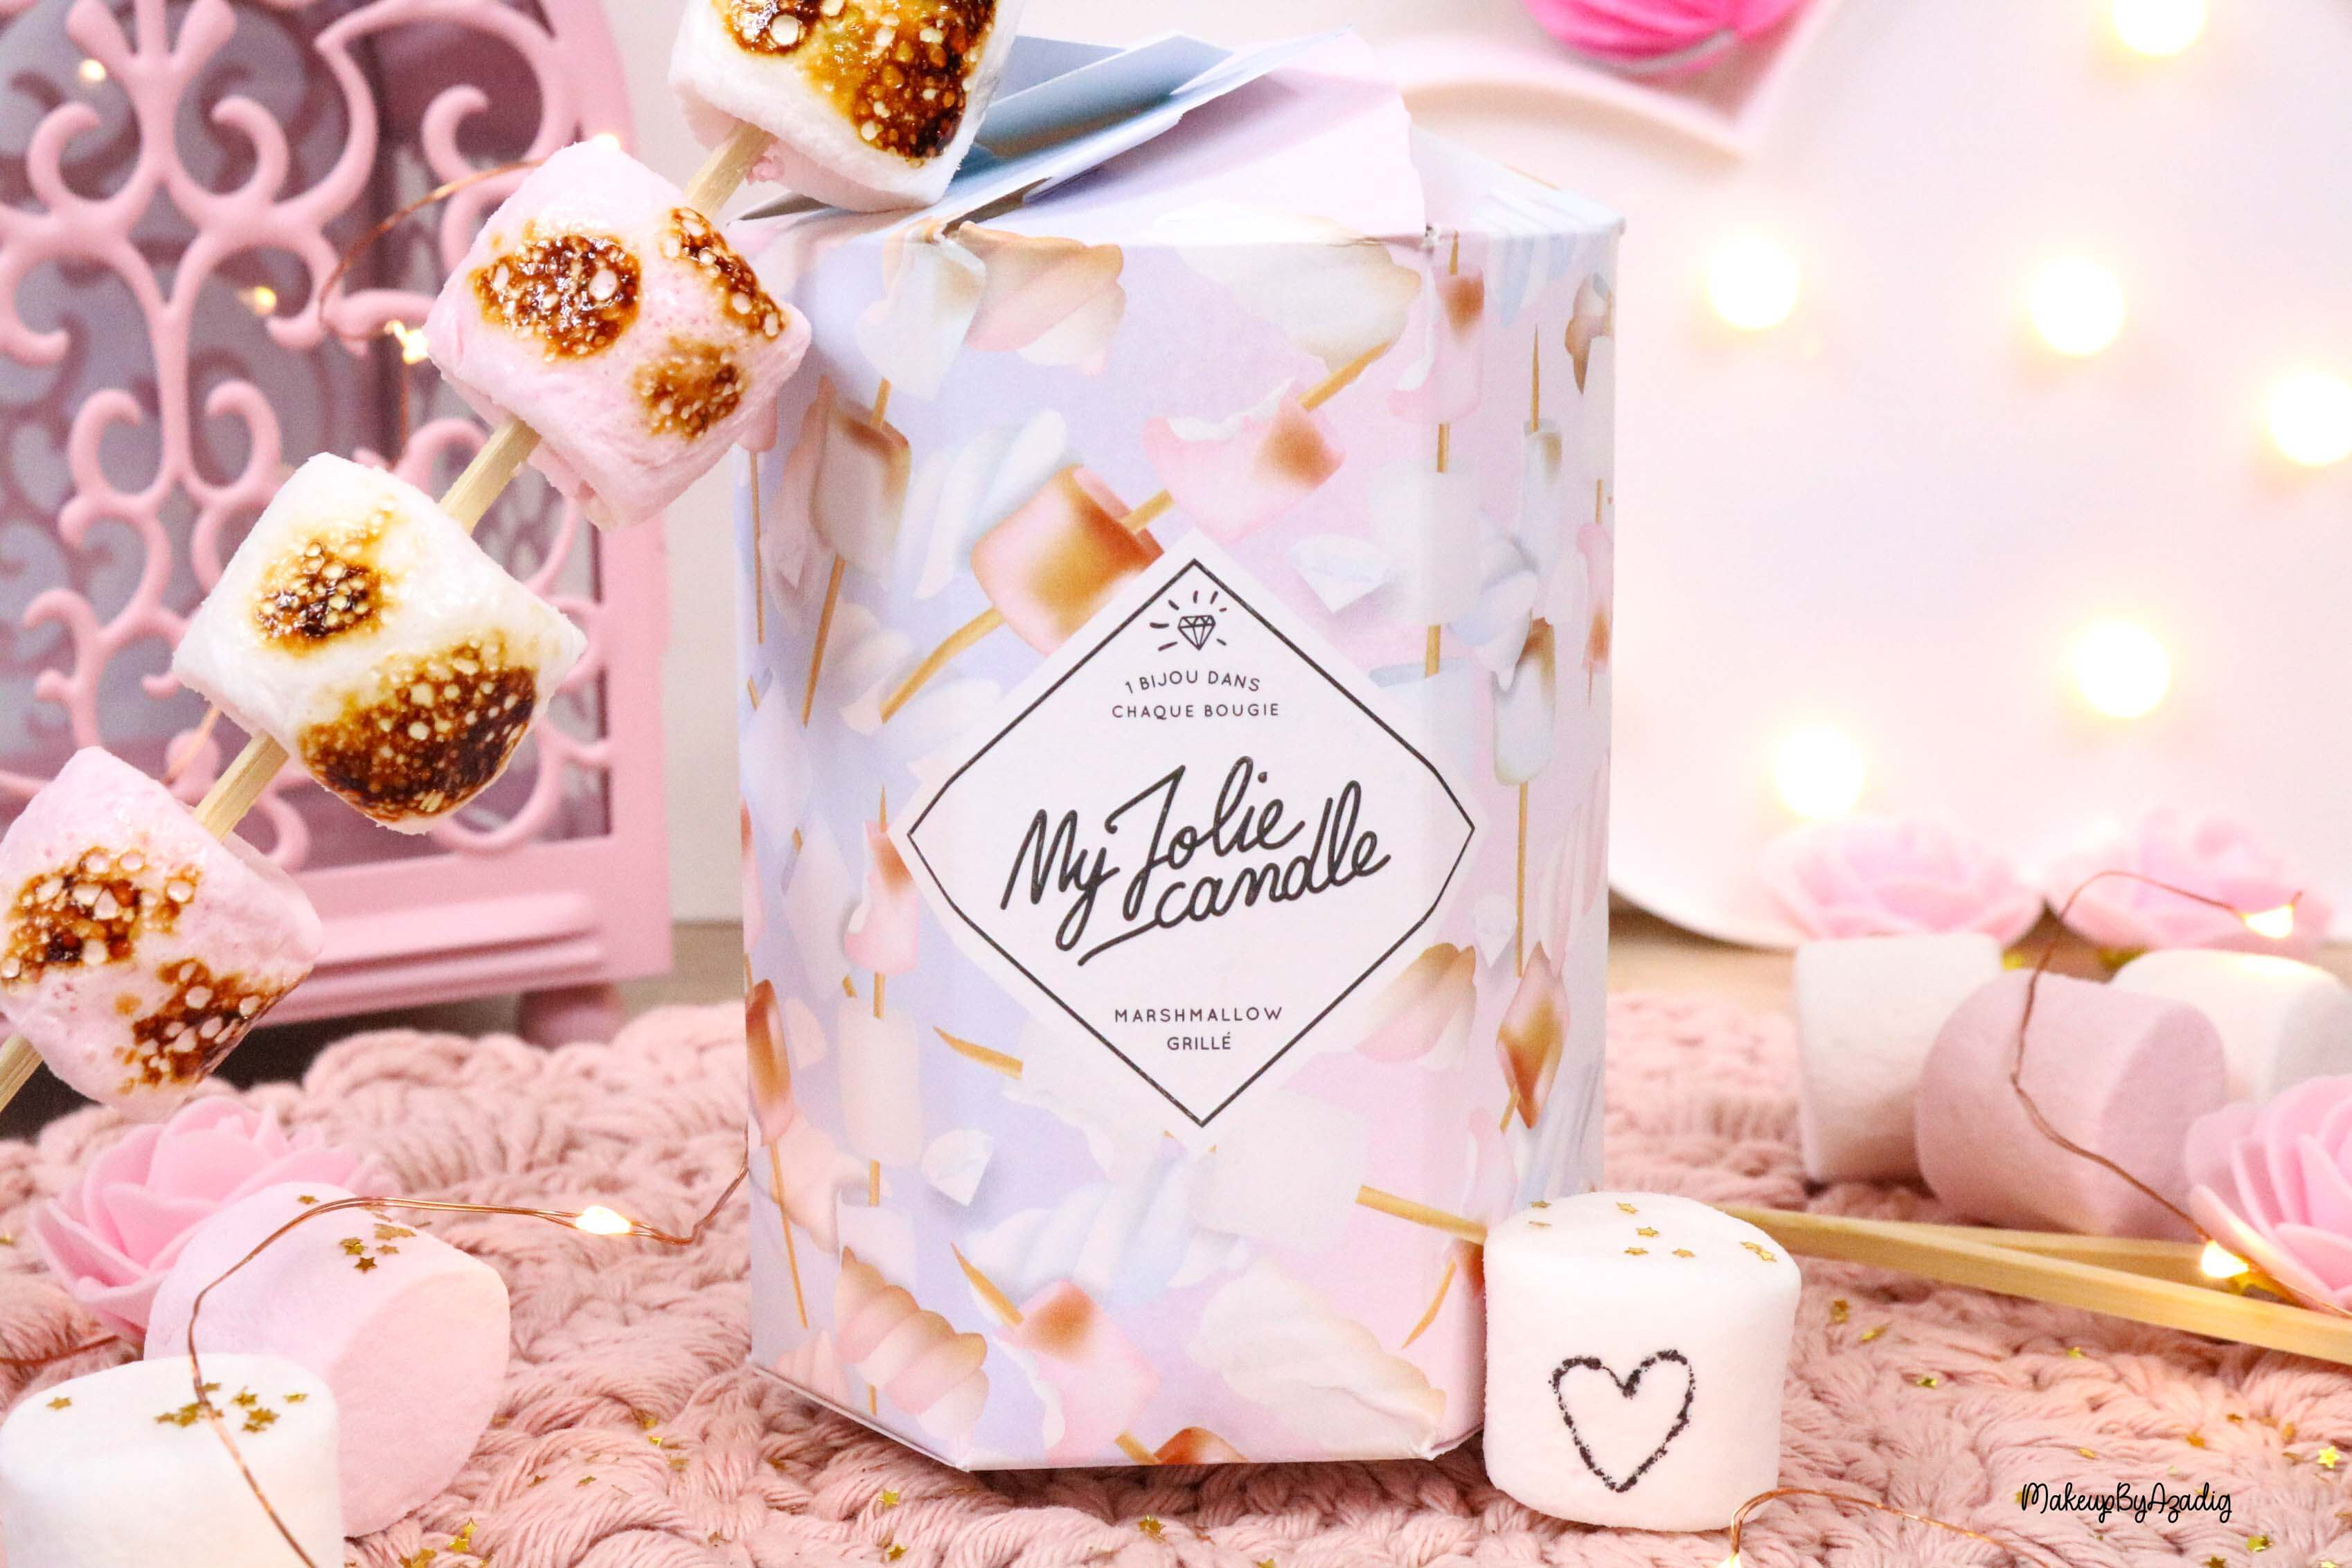 my-jolie-candle-bougie-bijou-swarovski-argent-cadeau-maman-mamie-femme-makeupbyazadig-collector-chamallow-avis-prix-packaging